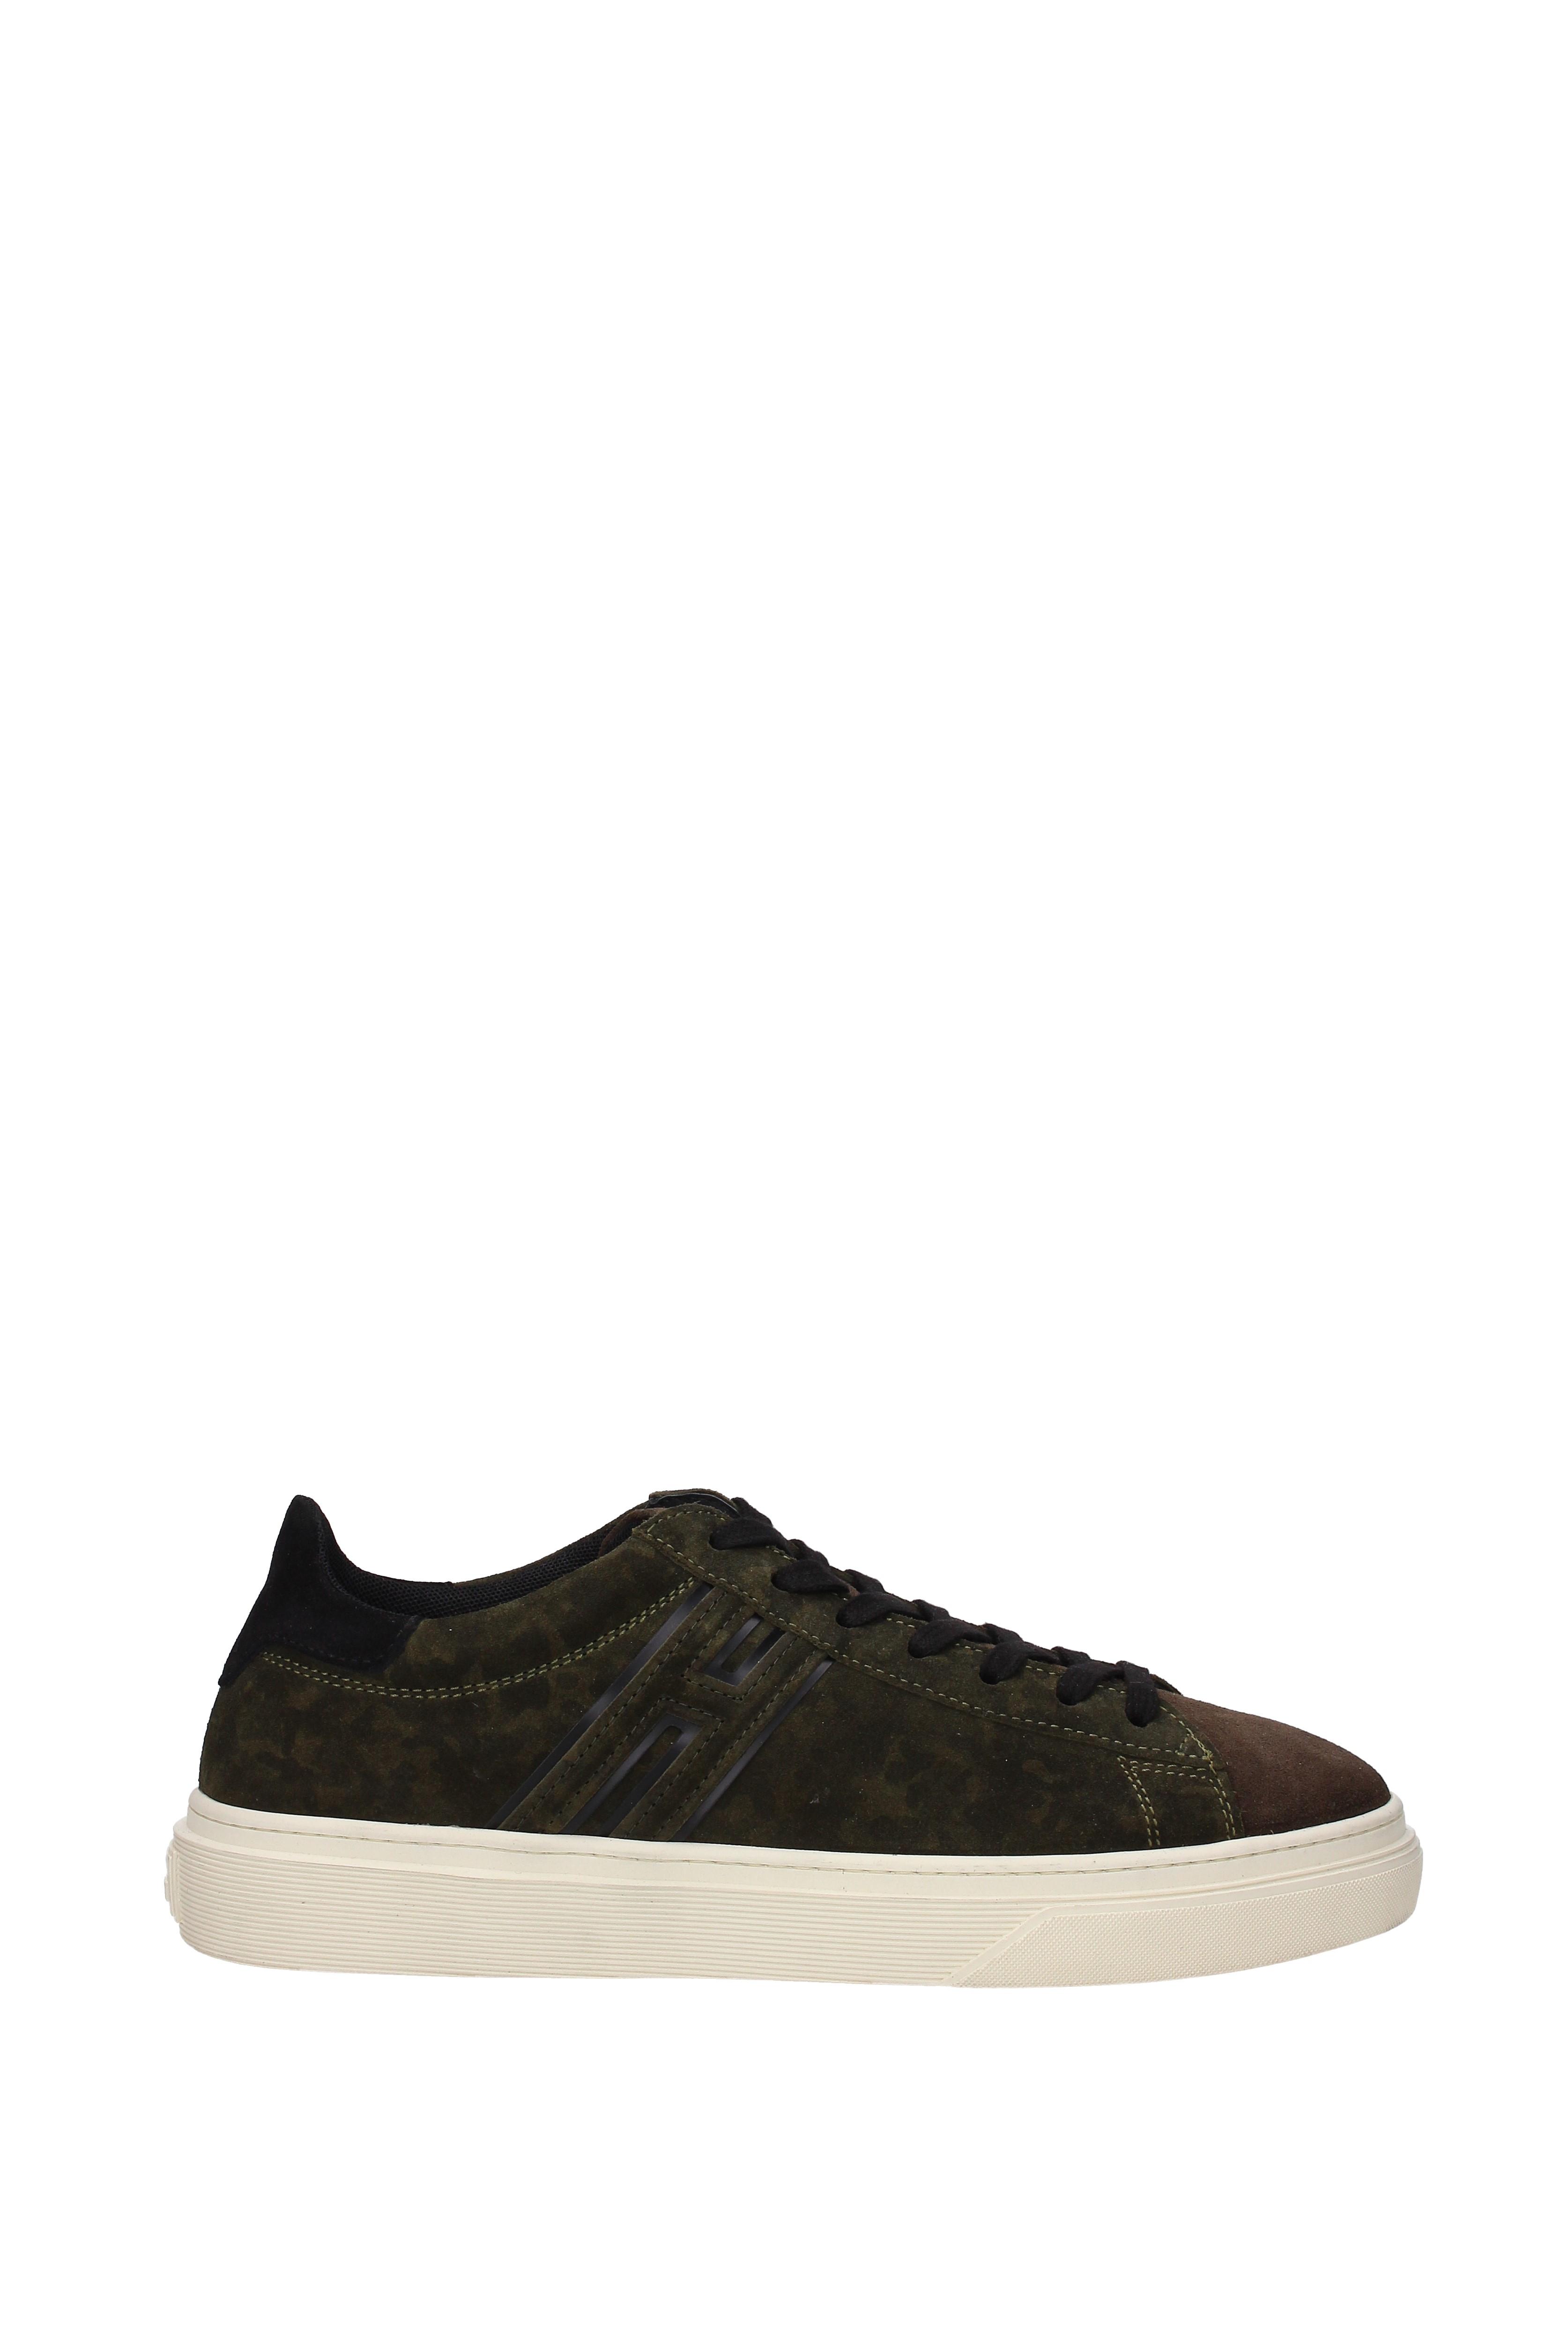 Sneakers Hogan Herren Herren Hogan - Wildleder (HXM3400J310HT8) 7073ae